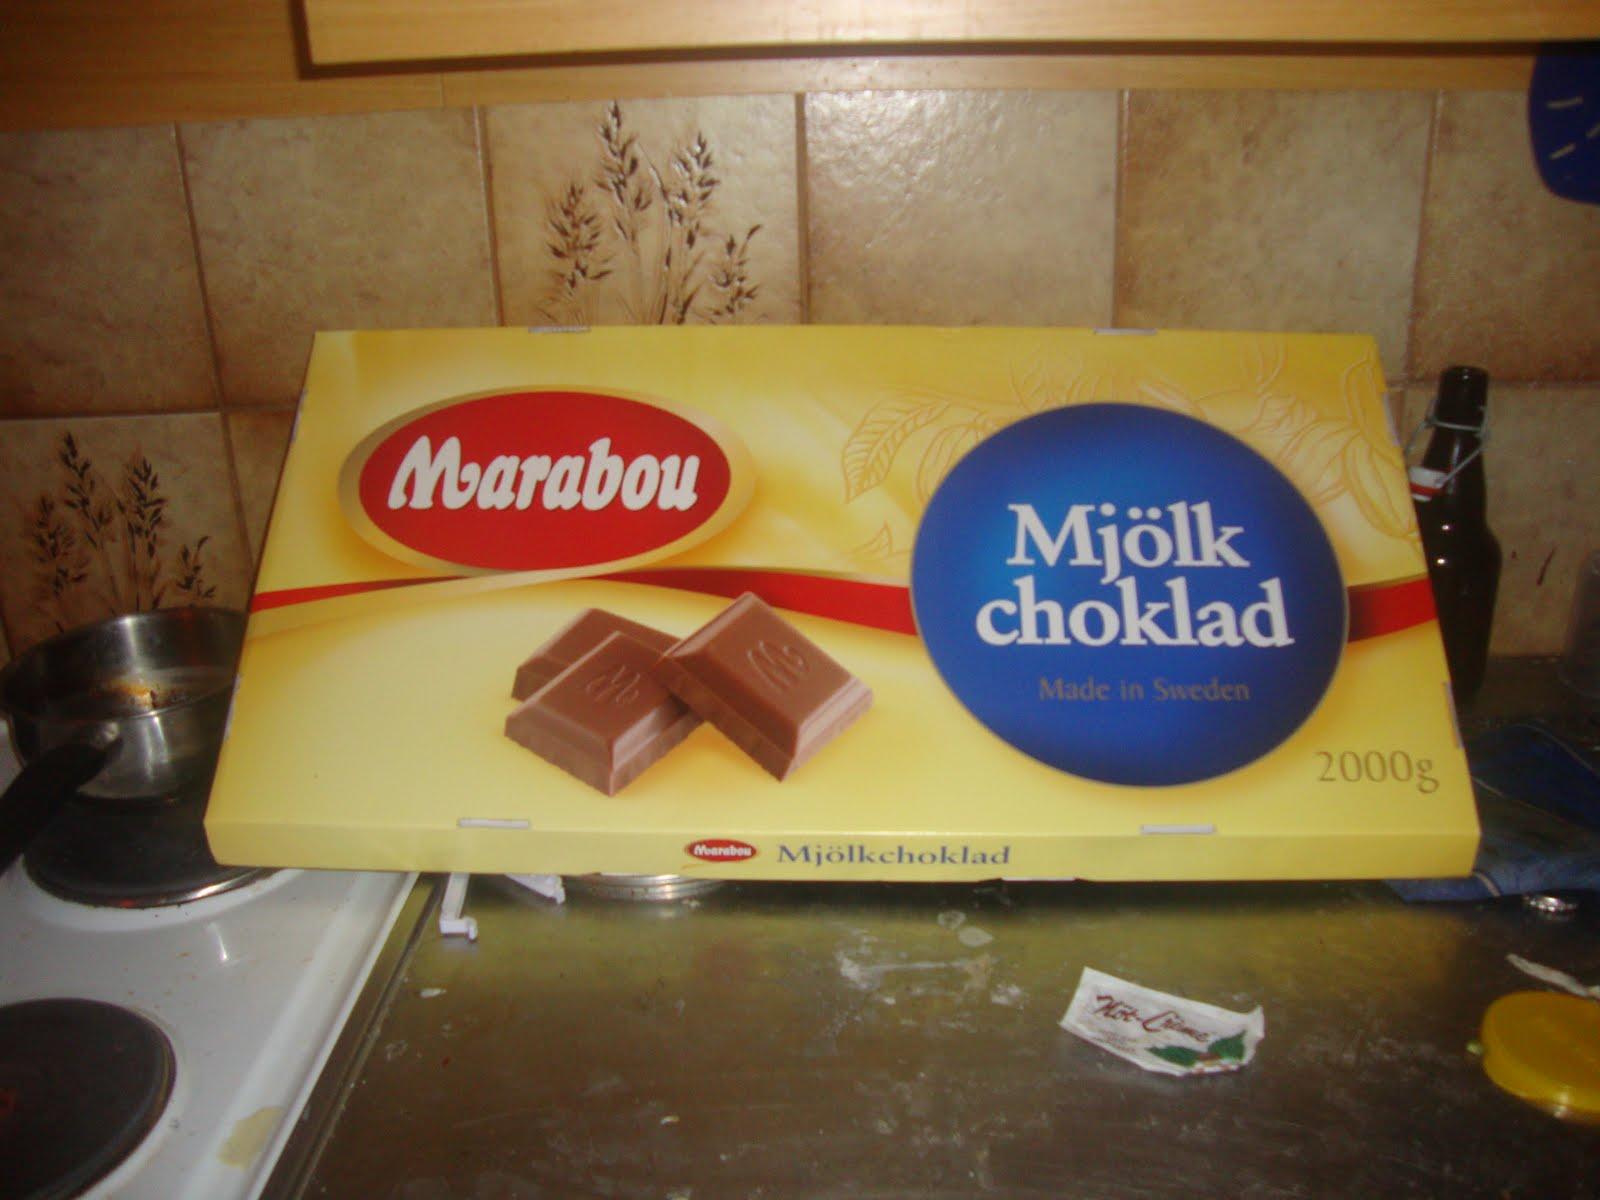 marabou choklad 2000g